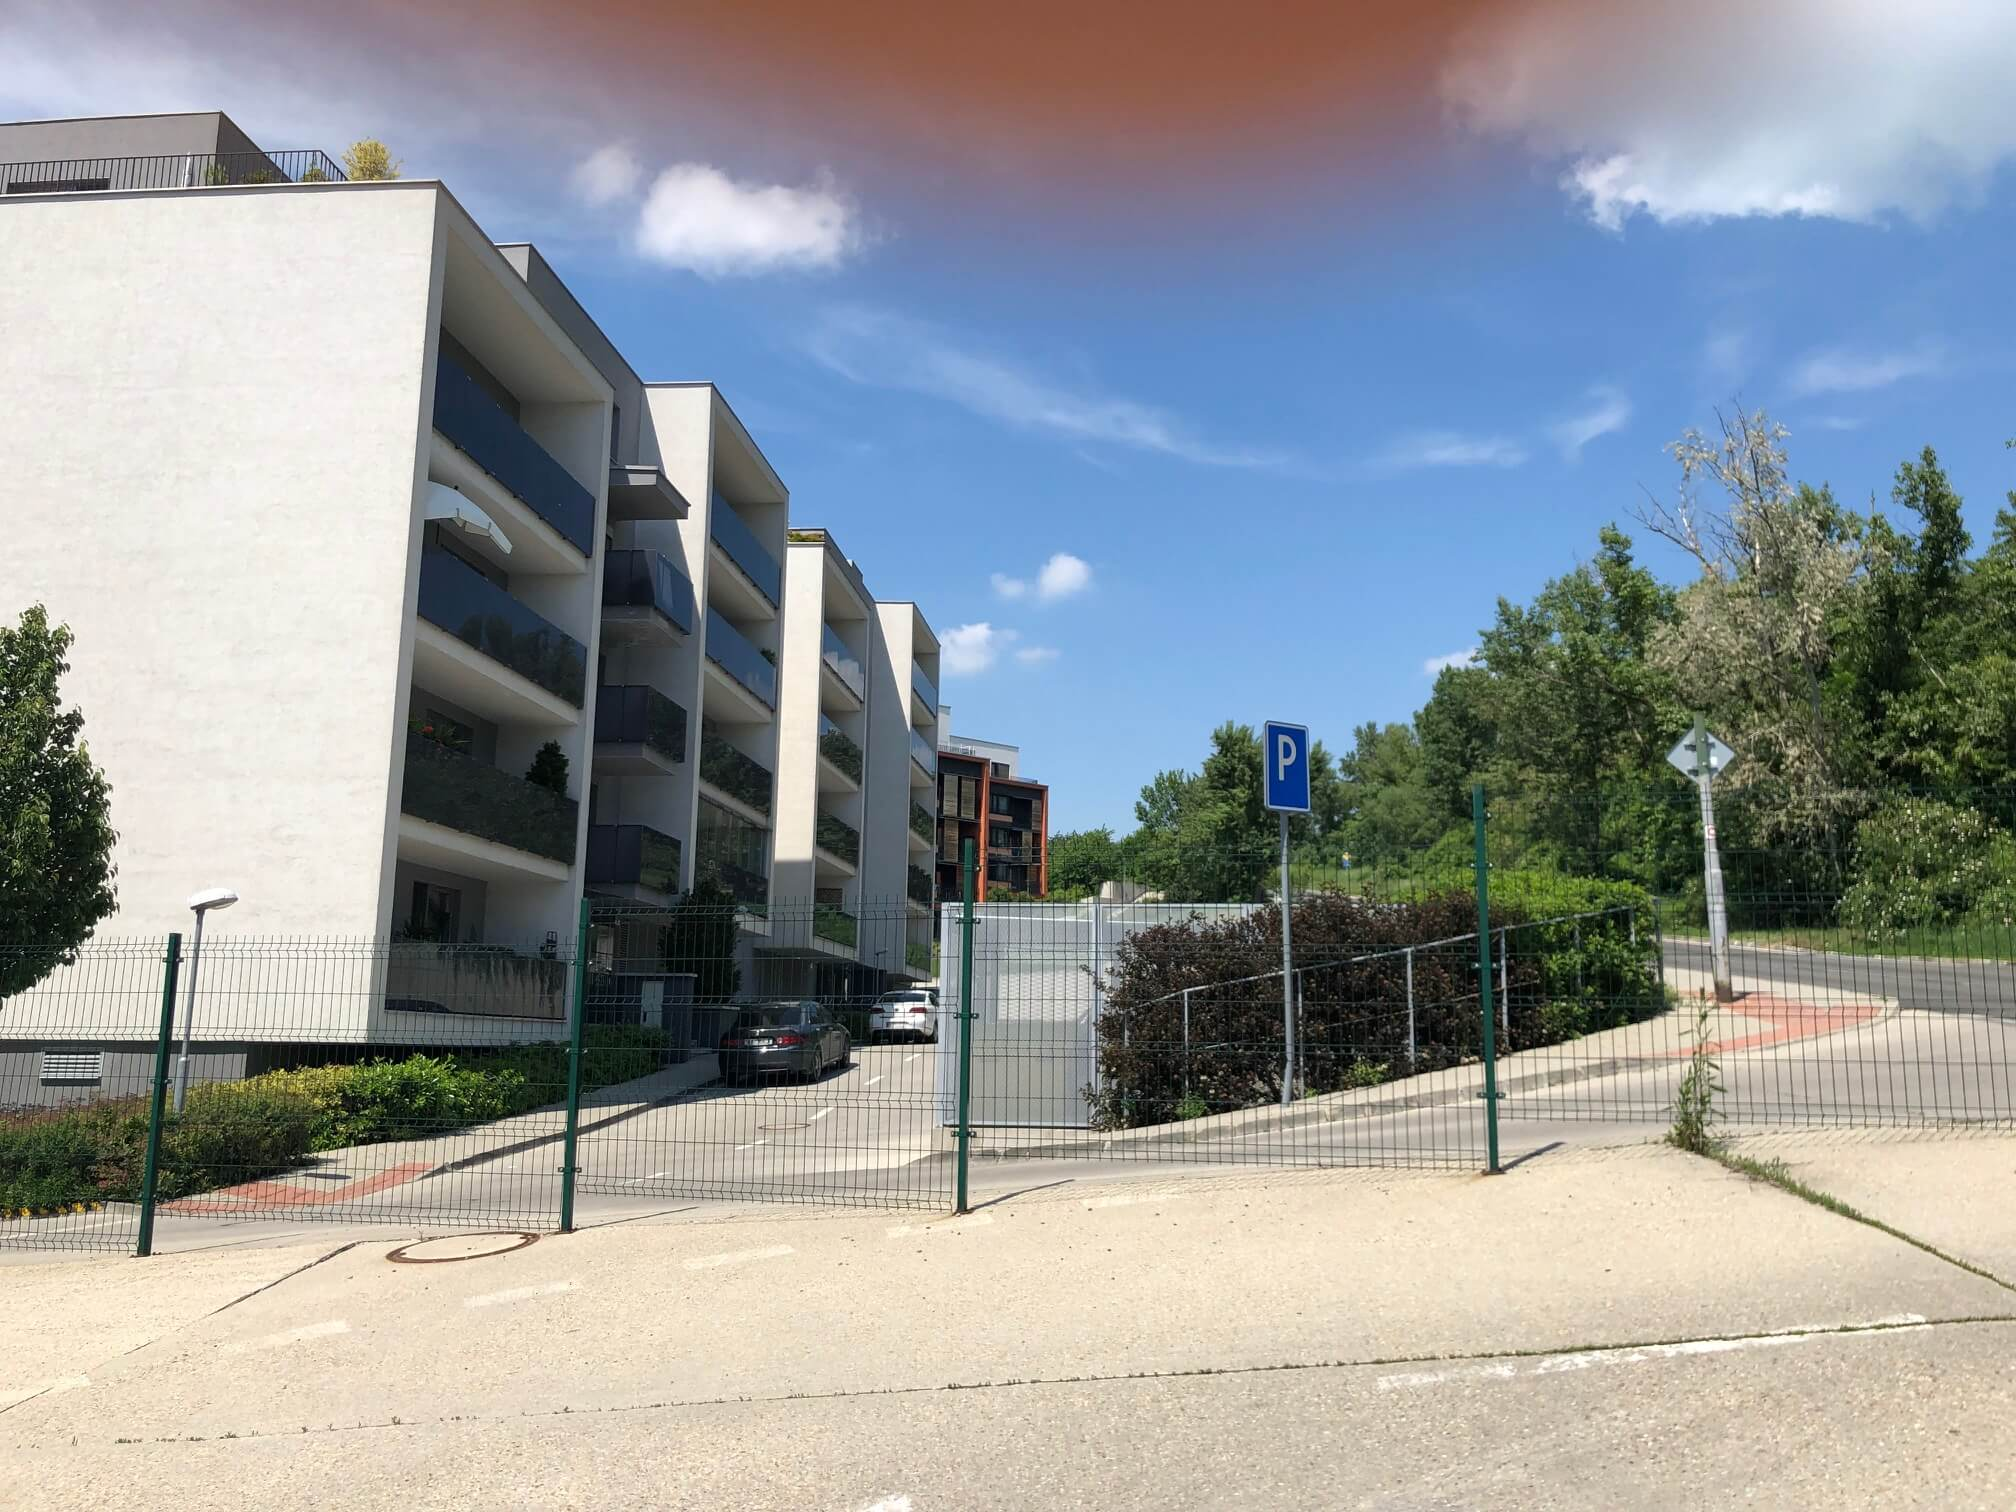 Rezervované: 3 izbový byt, novostavba, 72,25m2, loggia 4,82m2, Staré Grunty, Karlovka, garážové státie-70